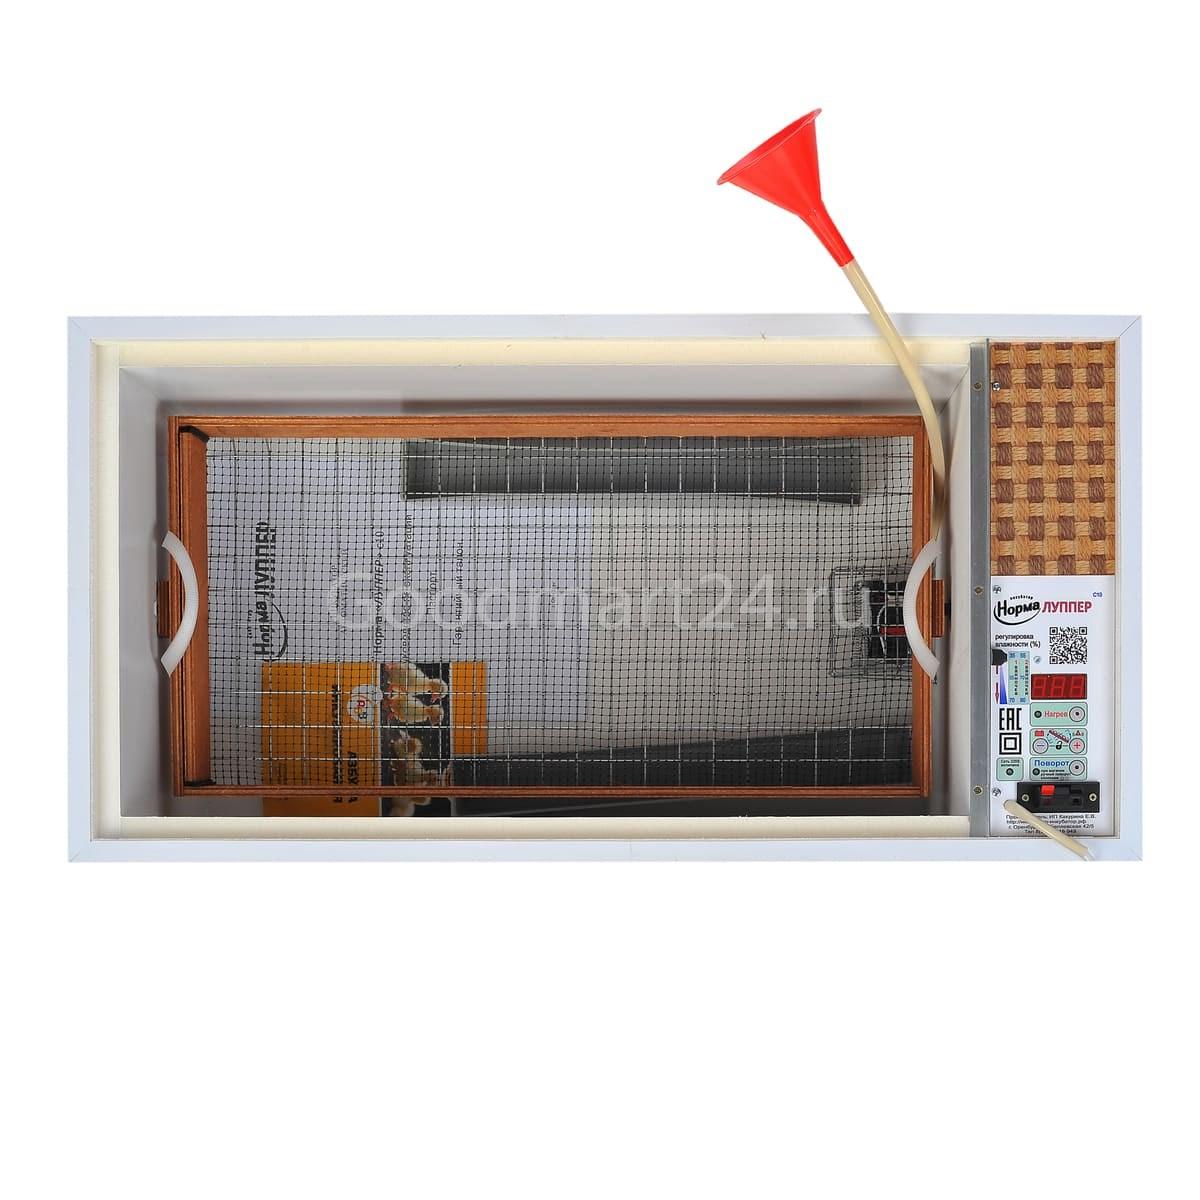 Инкубатор Норма Луппер 72 С8 цифровой 72 Яйца, 220/12В, автомат. поворот фото